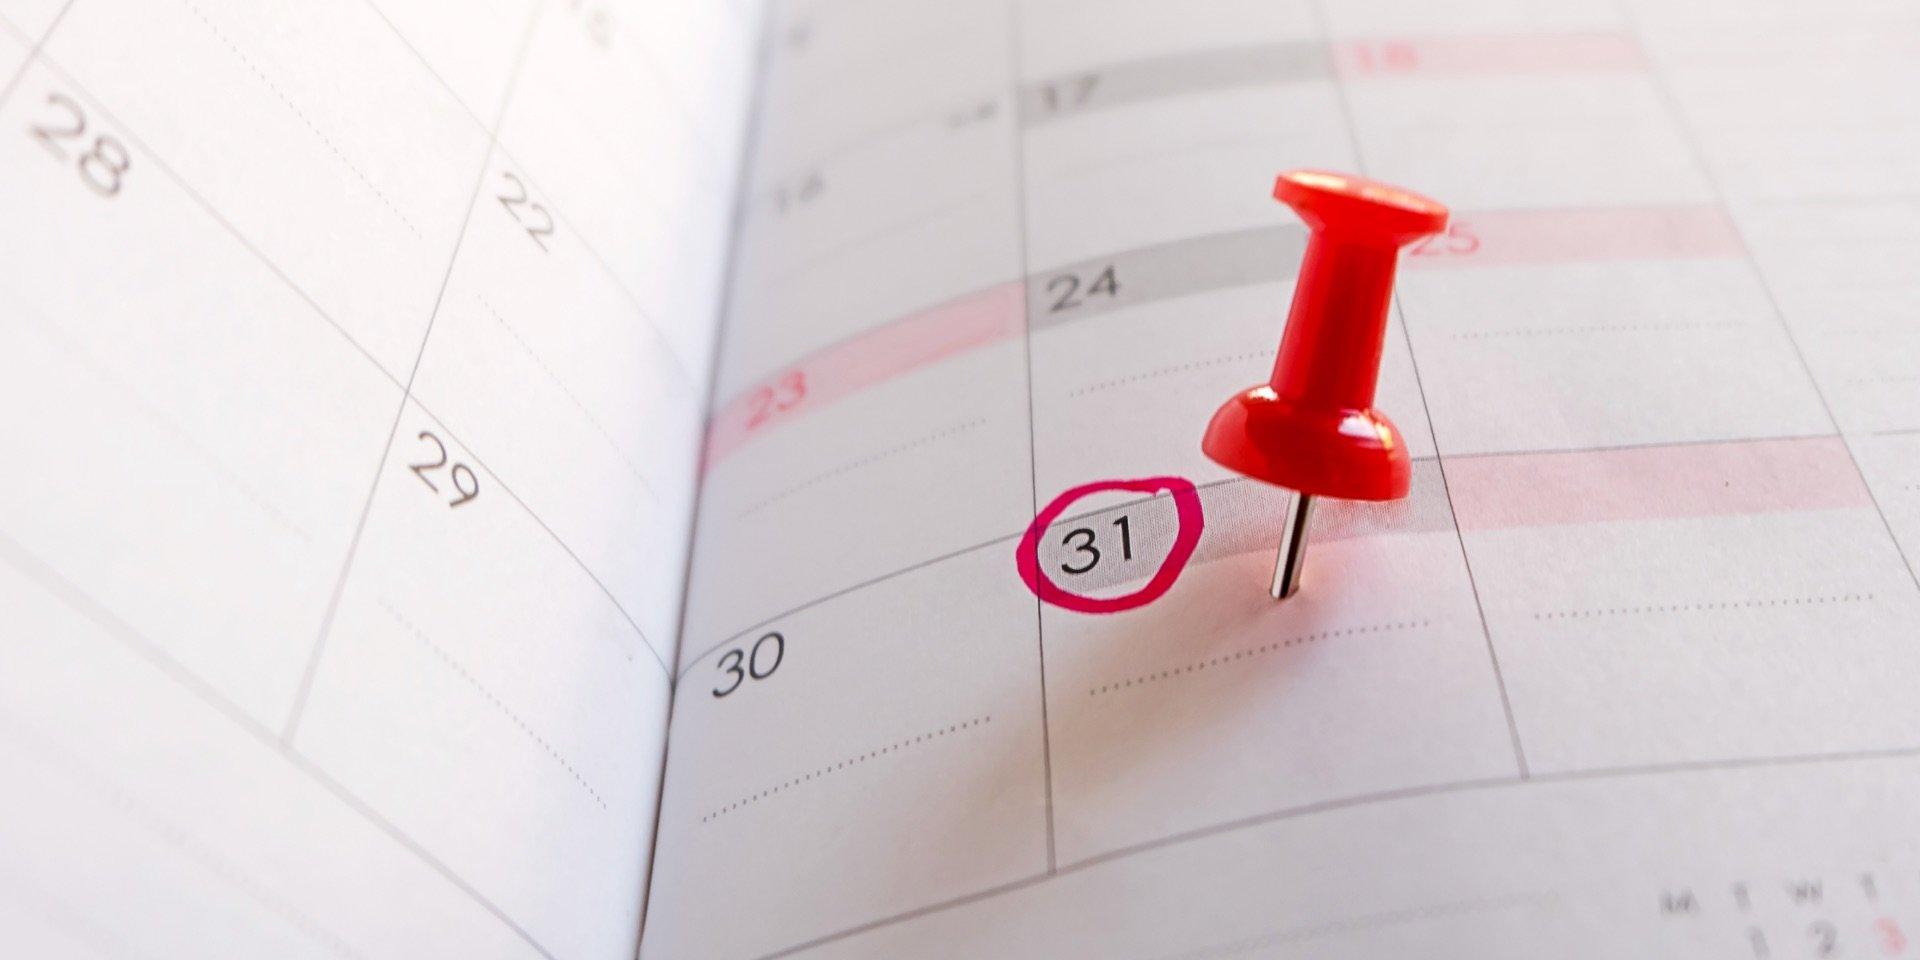 PCORI-fee-deadline-July 31-Bukaty-Hubsopt-Spring 2021